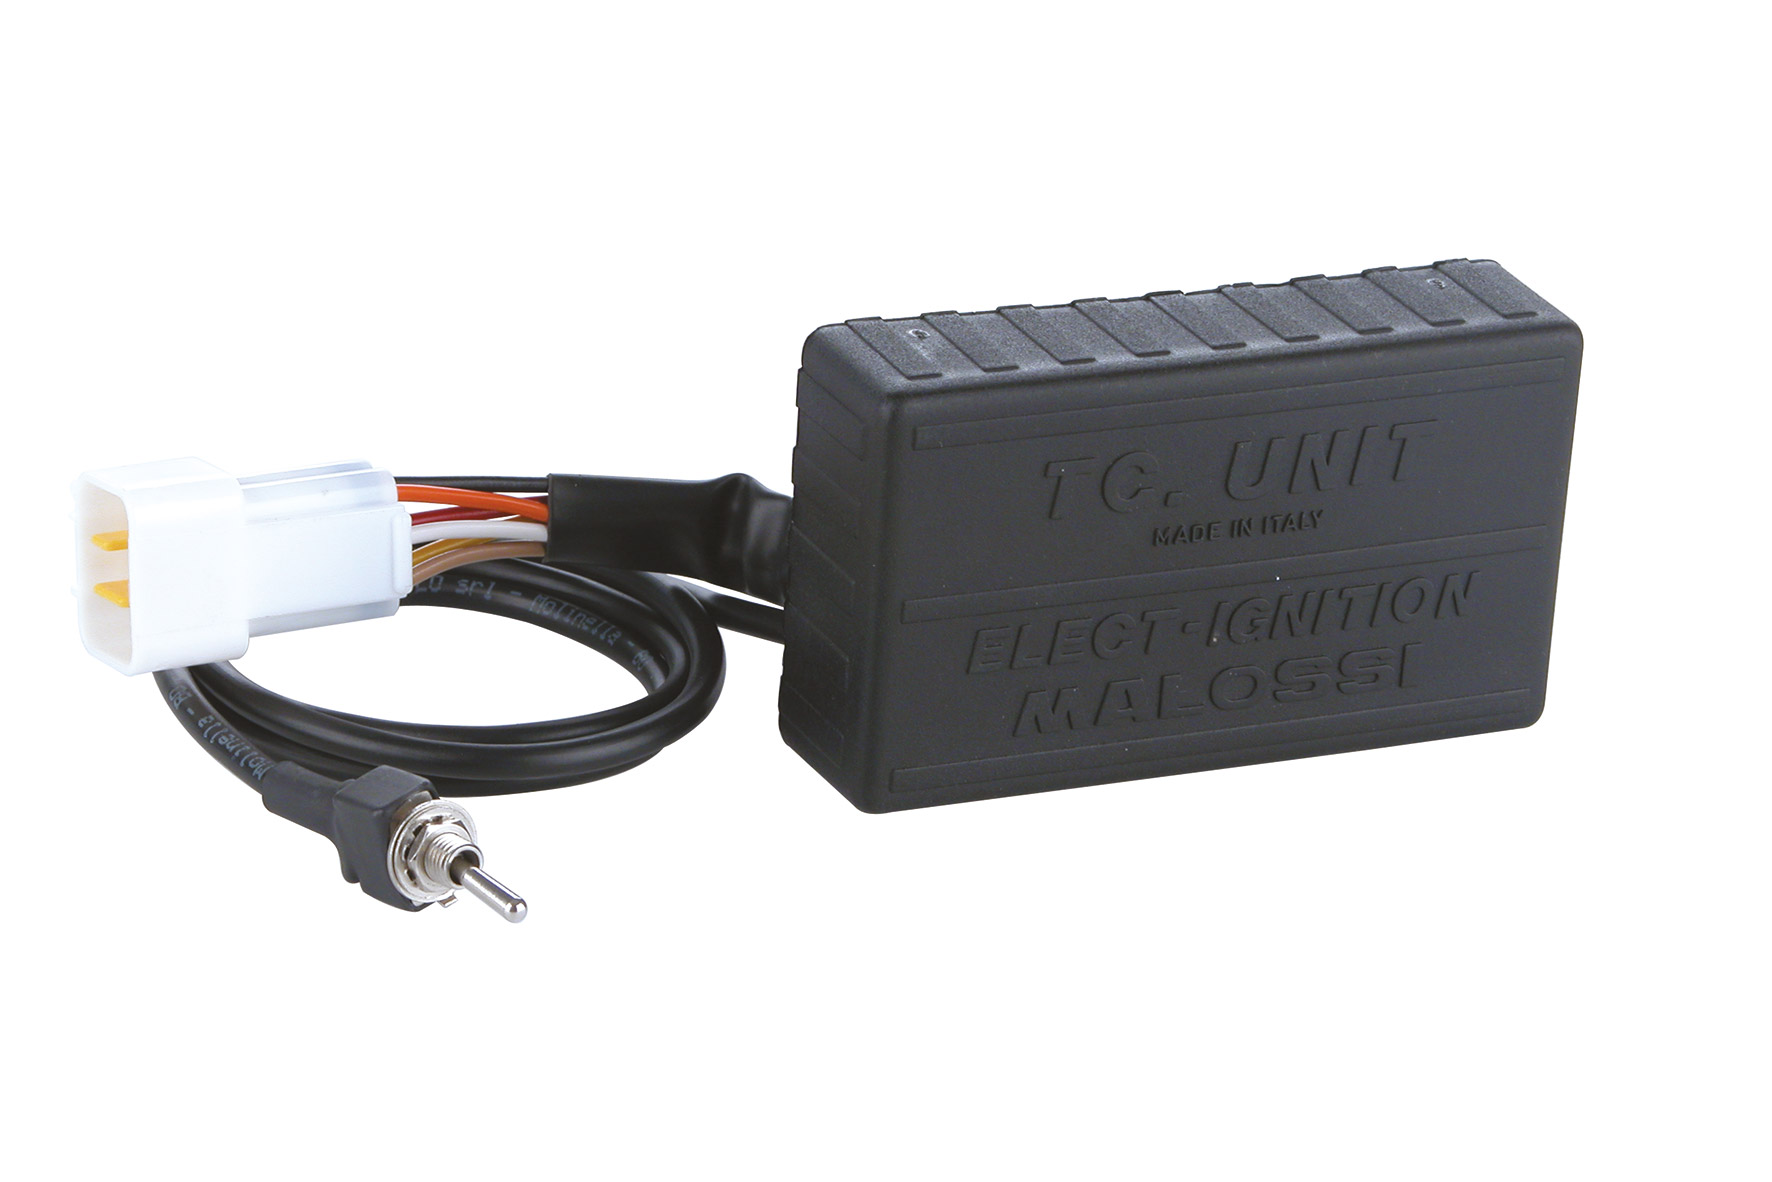 TC UNIT RPM CONTROL electronic controll.